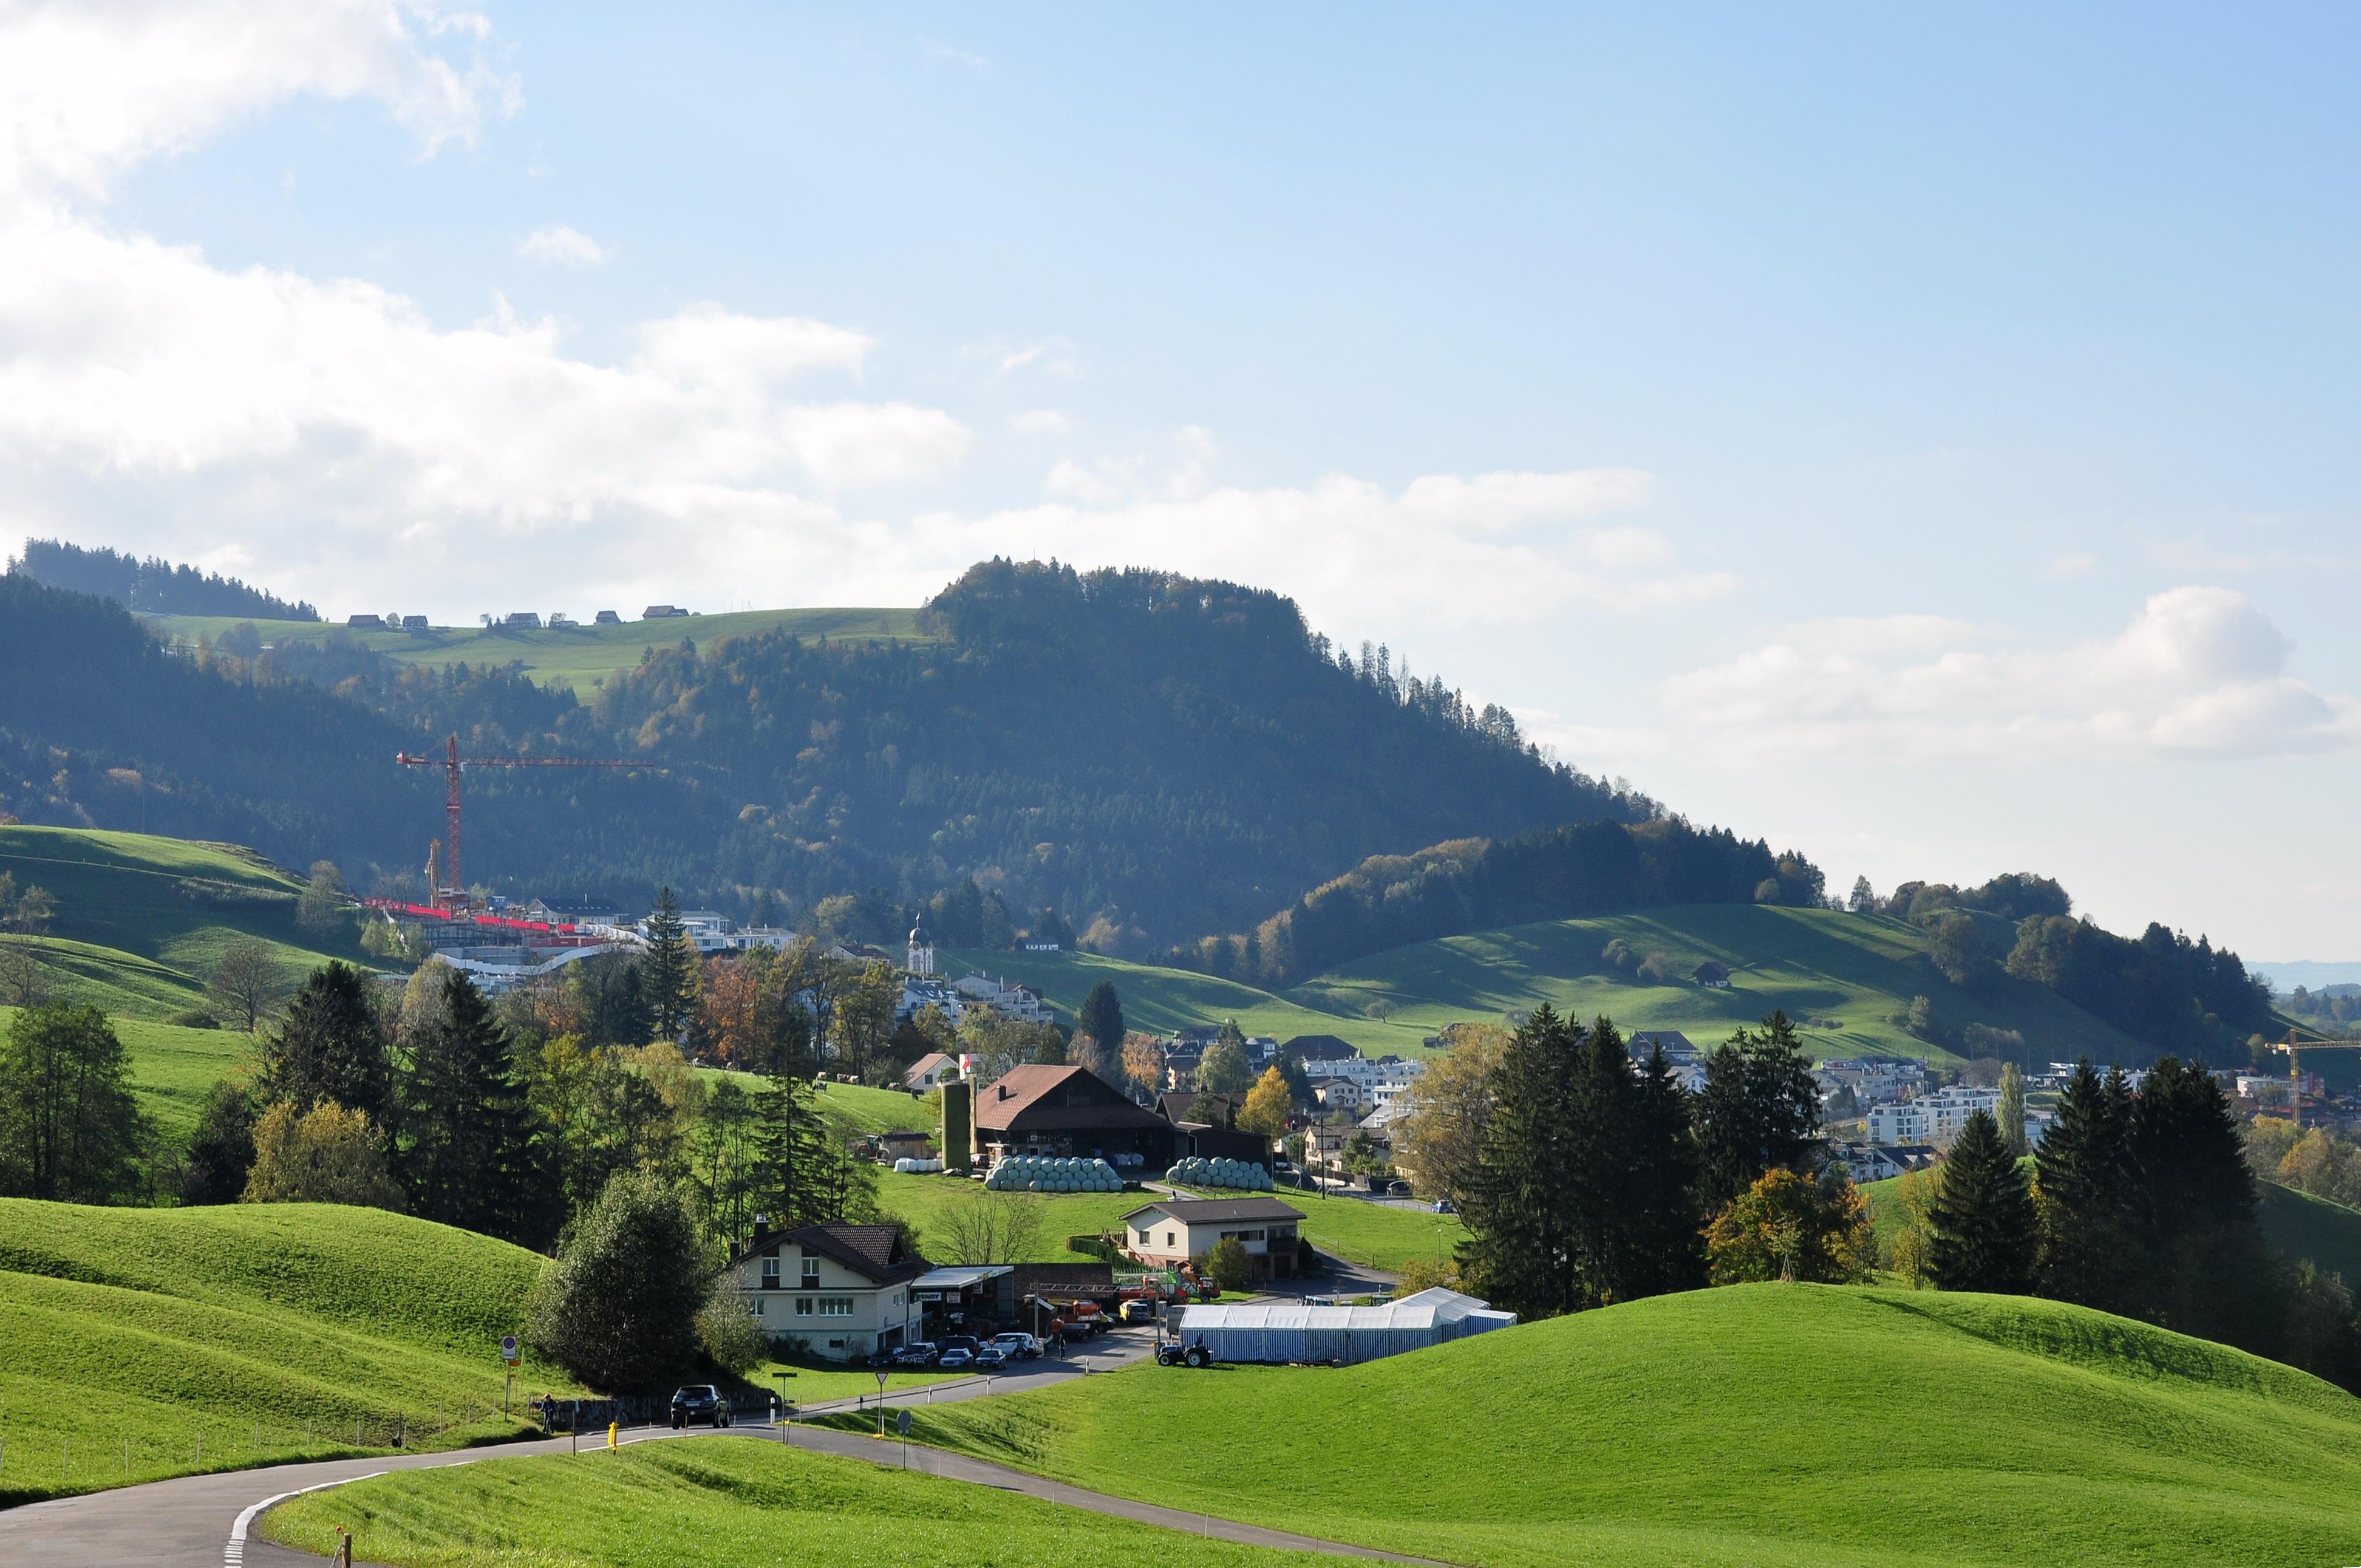 Schindellegi Switzerland  city photo : Original file  3,888 × 2,582 pixels, file size: 1.89 MB, MIME ...